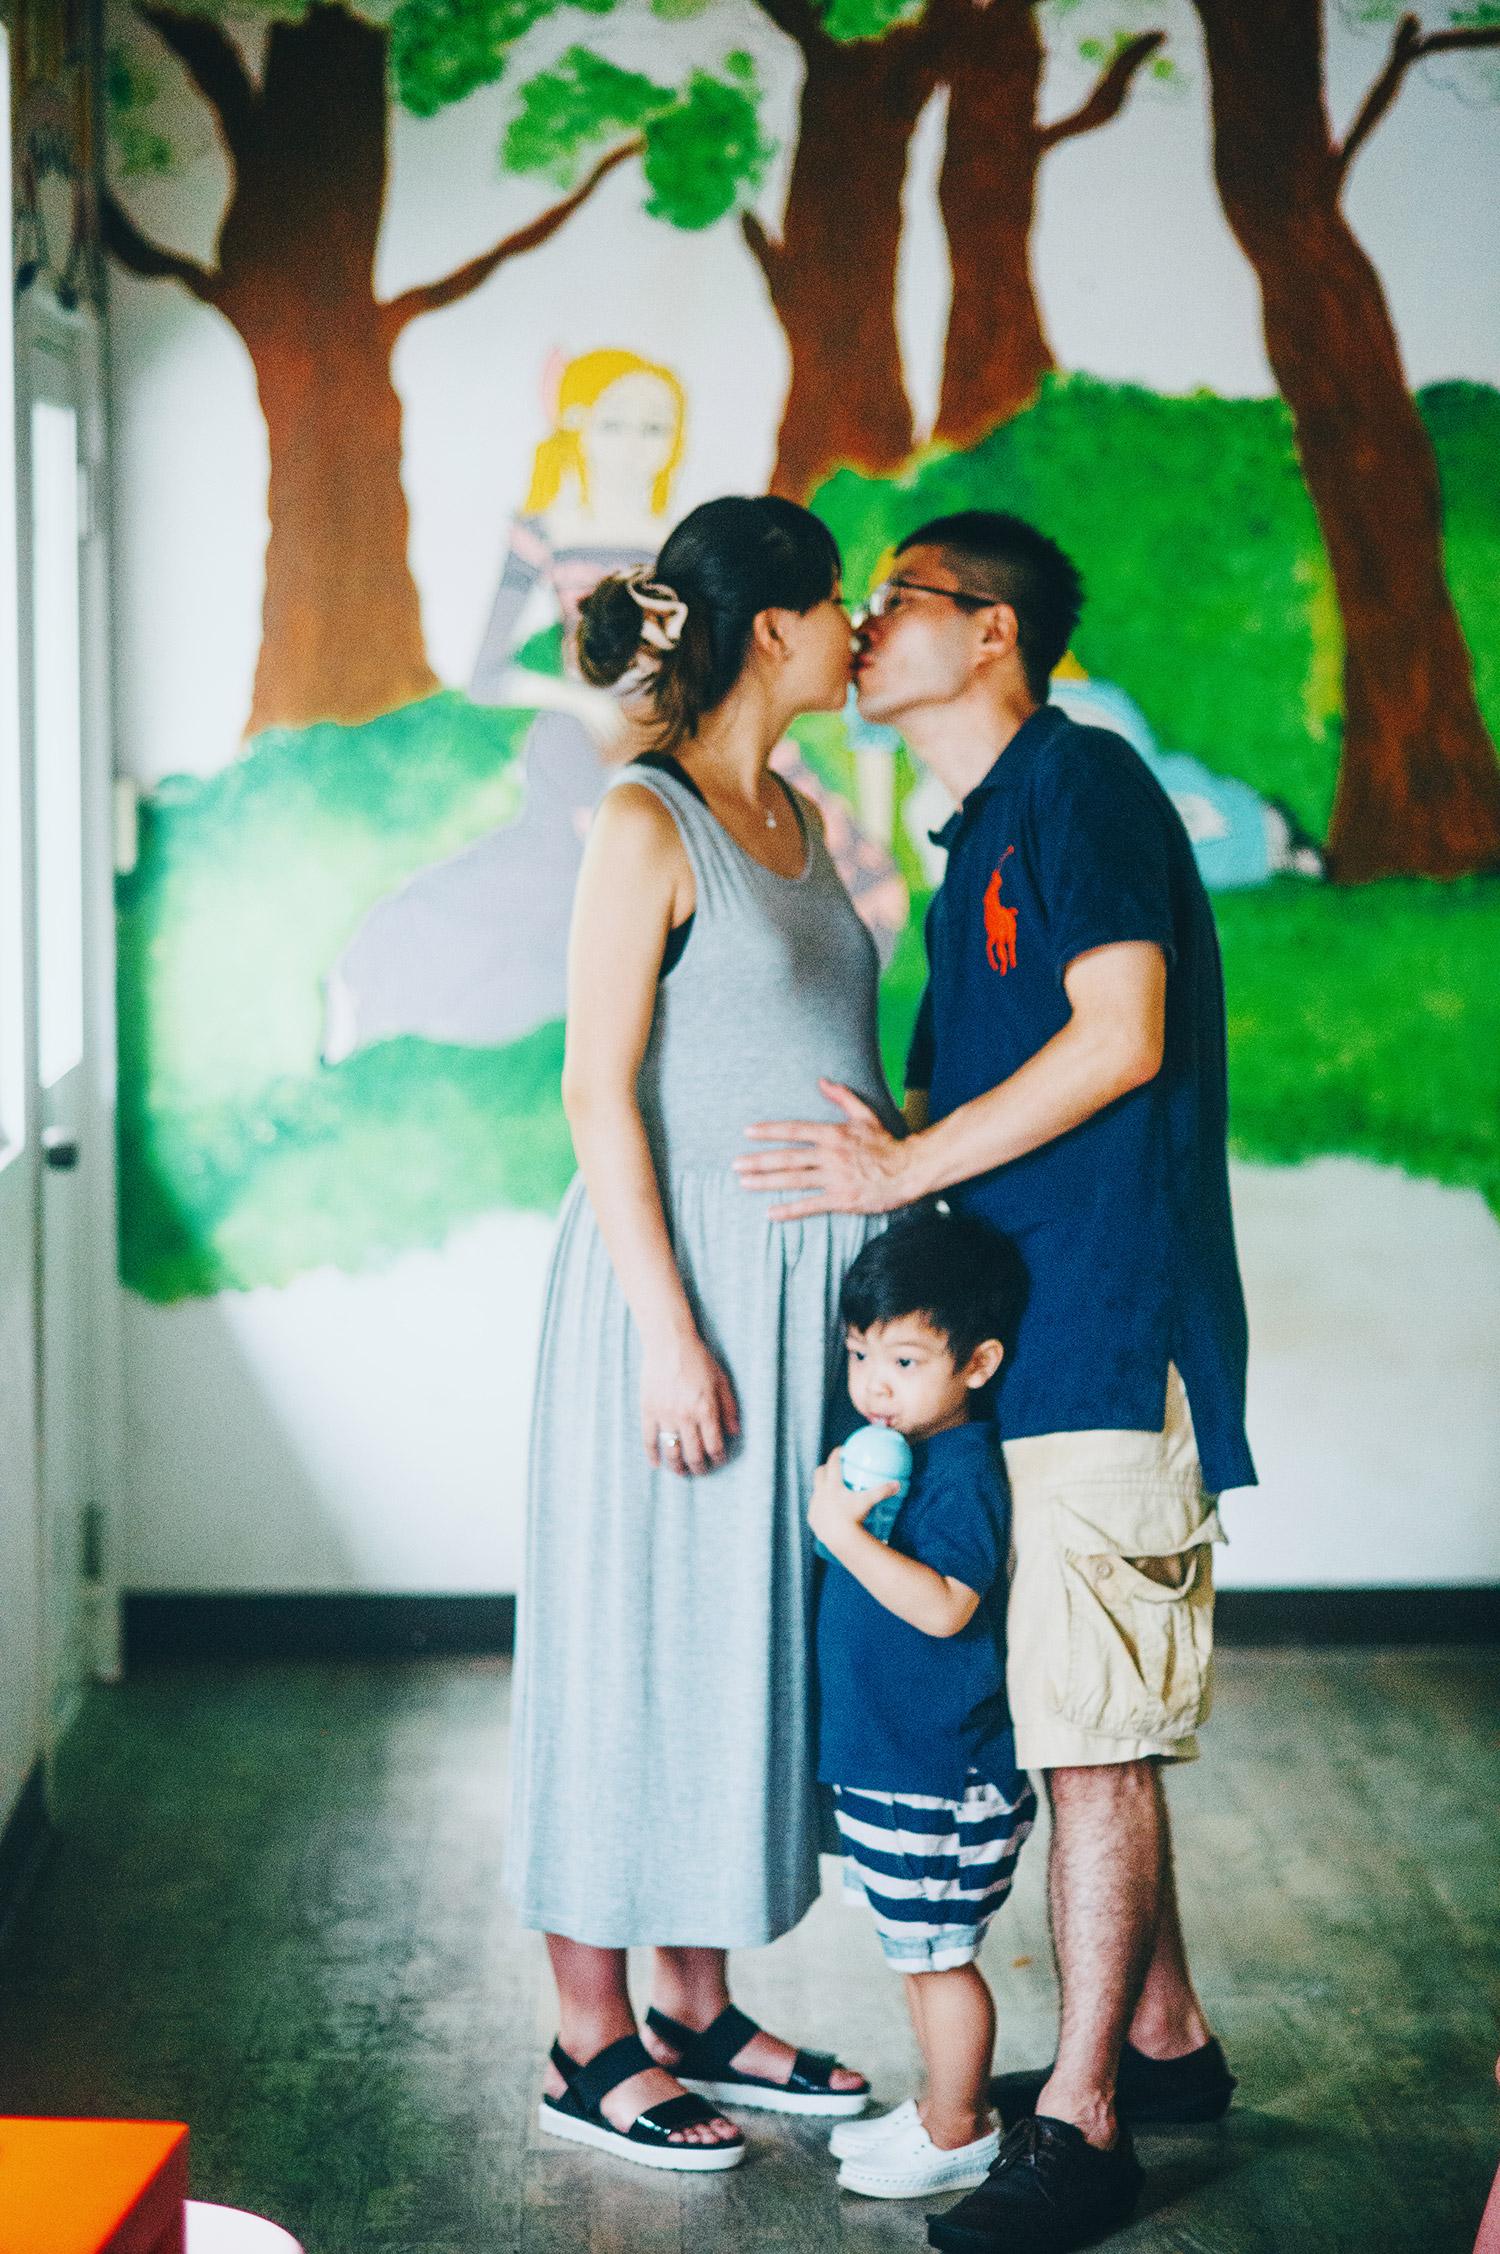 family_kid_001_047